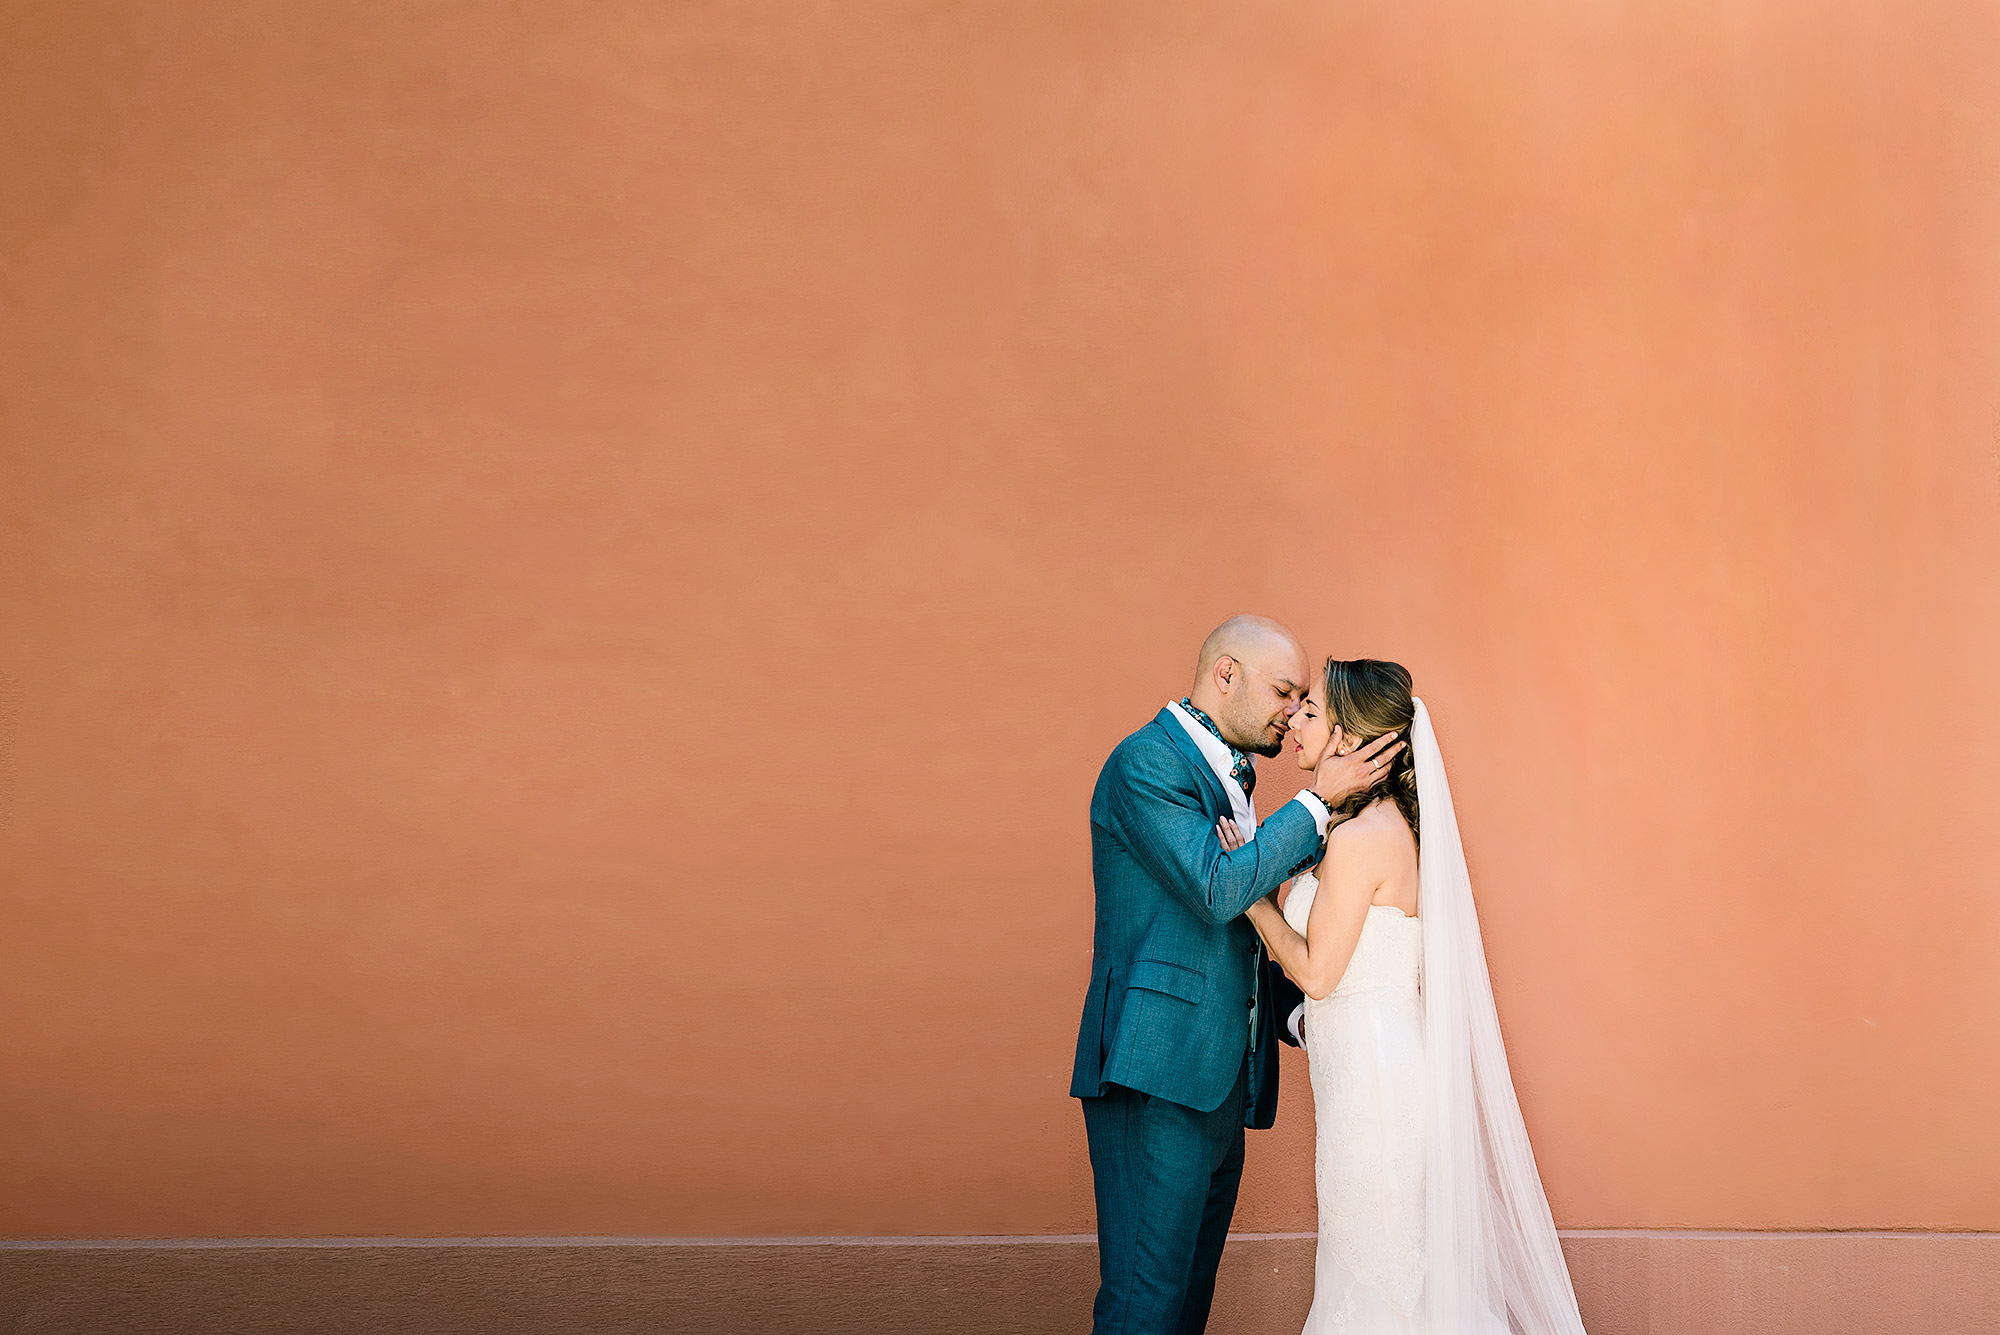 destination-wedding-photographer-wedding-marrakech